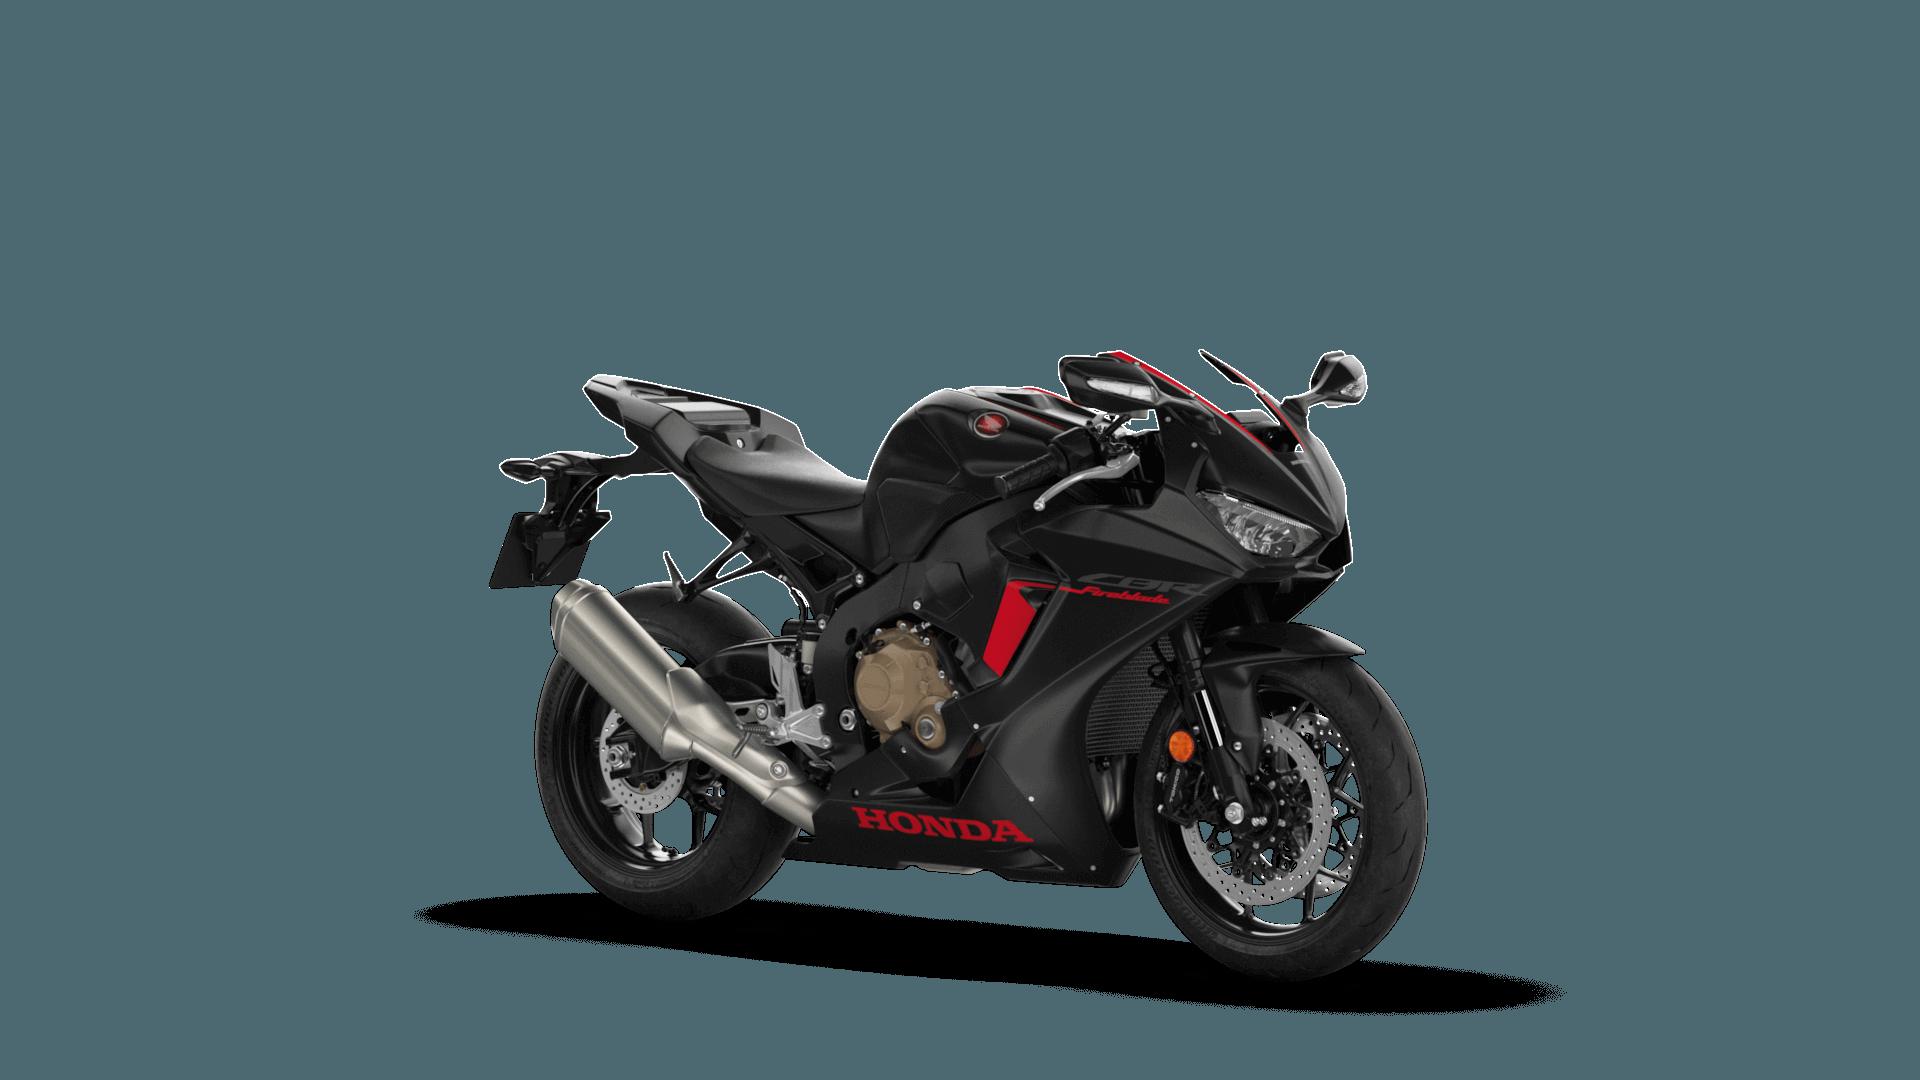 2017 Honda Cbr 1000rr Auxdelicesdirene Com